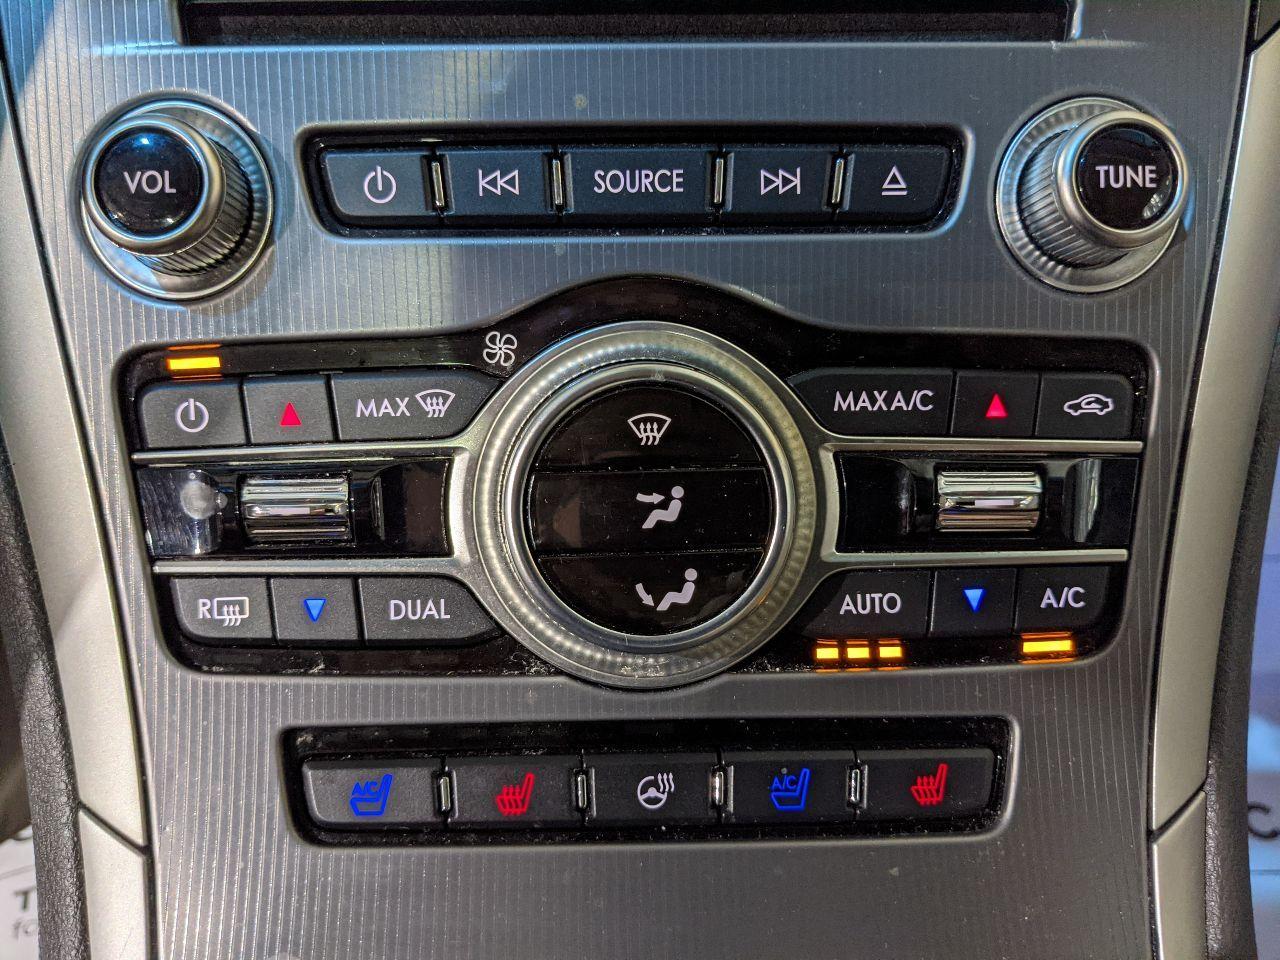 2018 Lincoln MKZ Hybrid